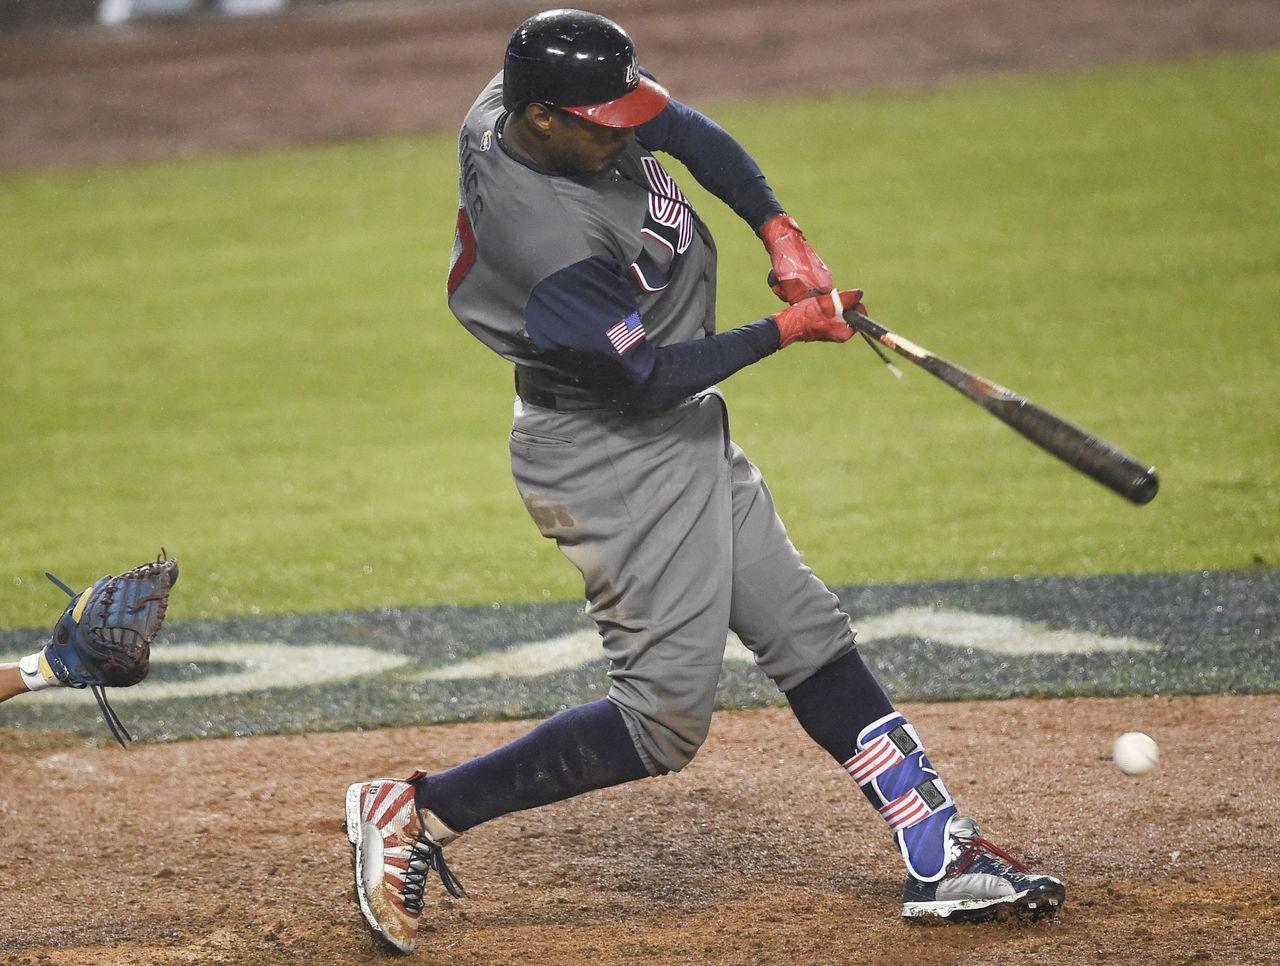 Cropped 2017 03 22t035015z 457675011 nocid rtrmadp 3 baseball world baseball classic usa at japan